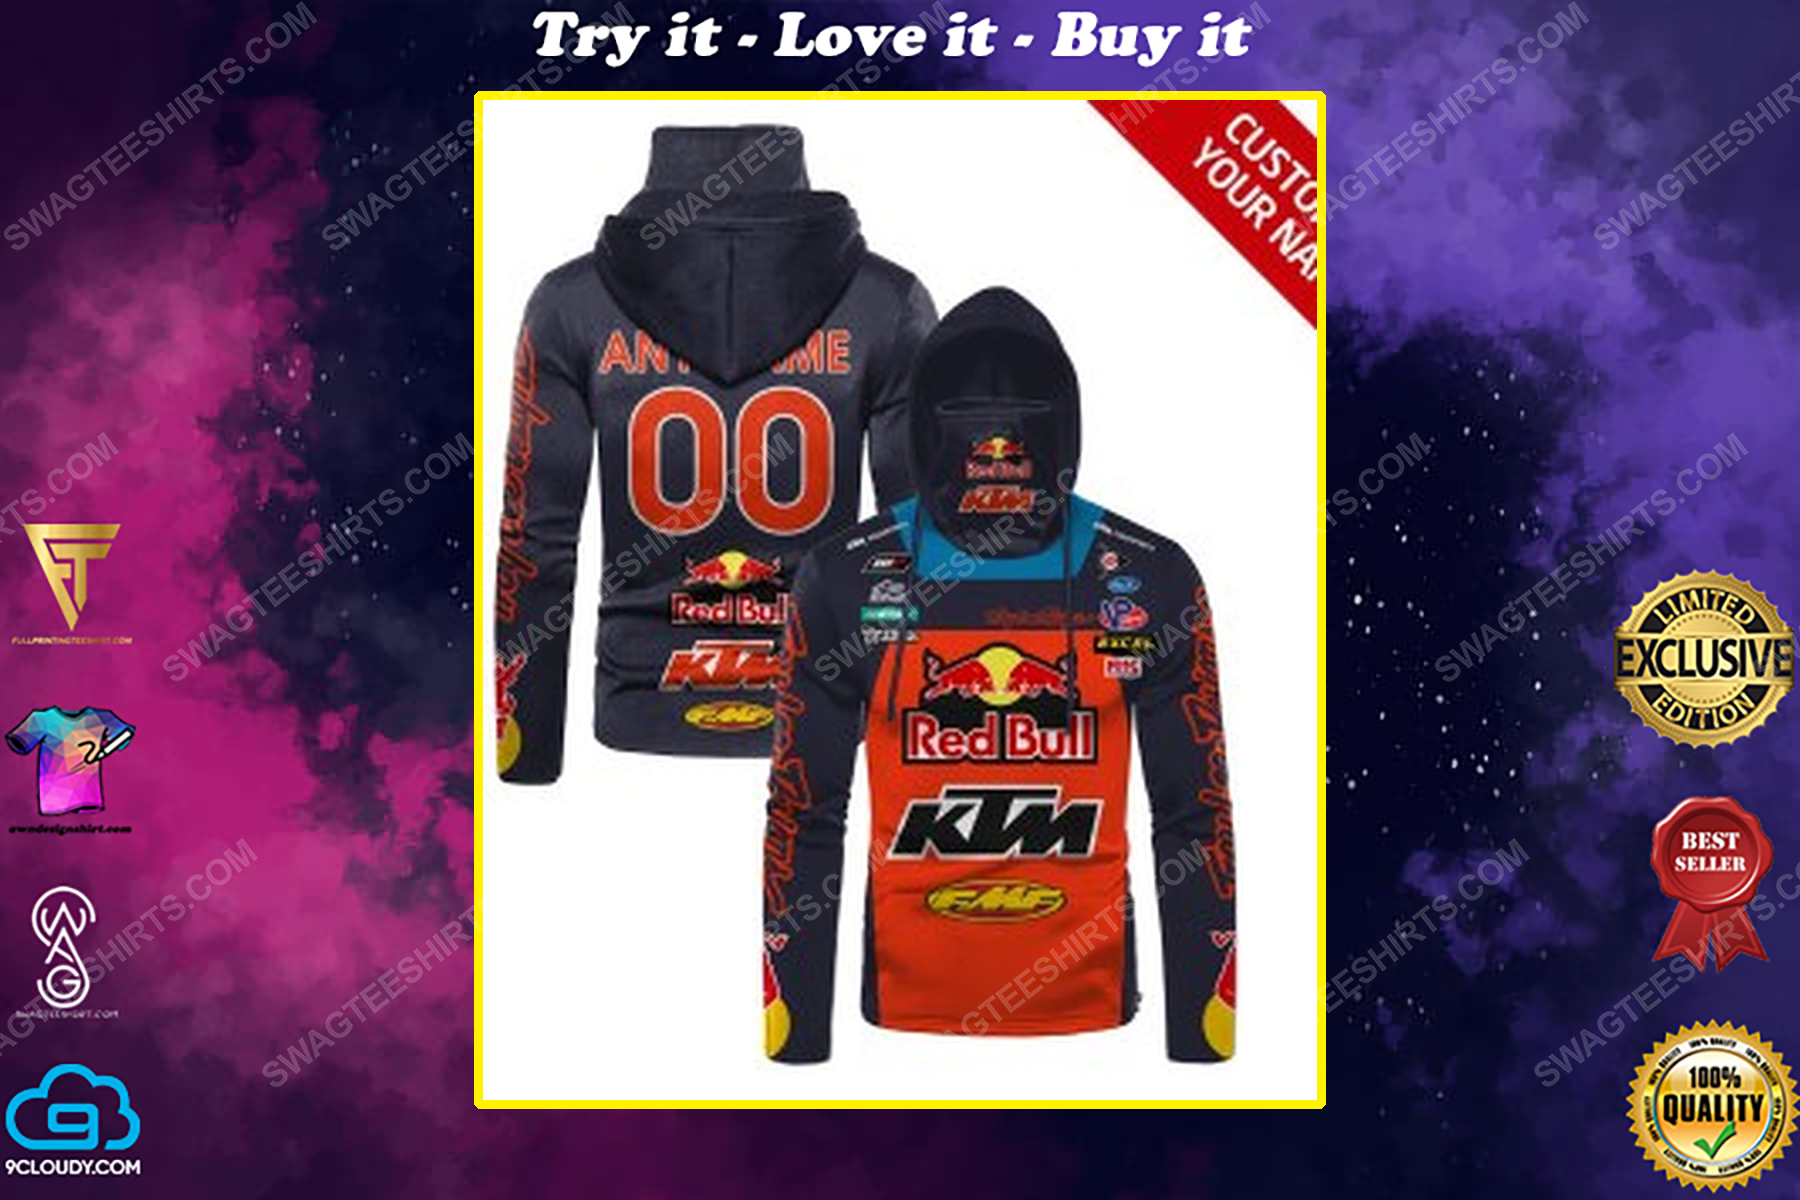 Custom name red bull ktm factory racing full print mask hoodie